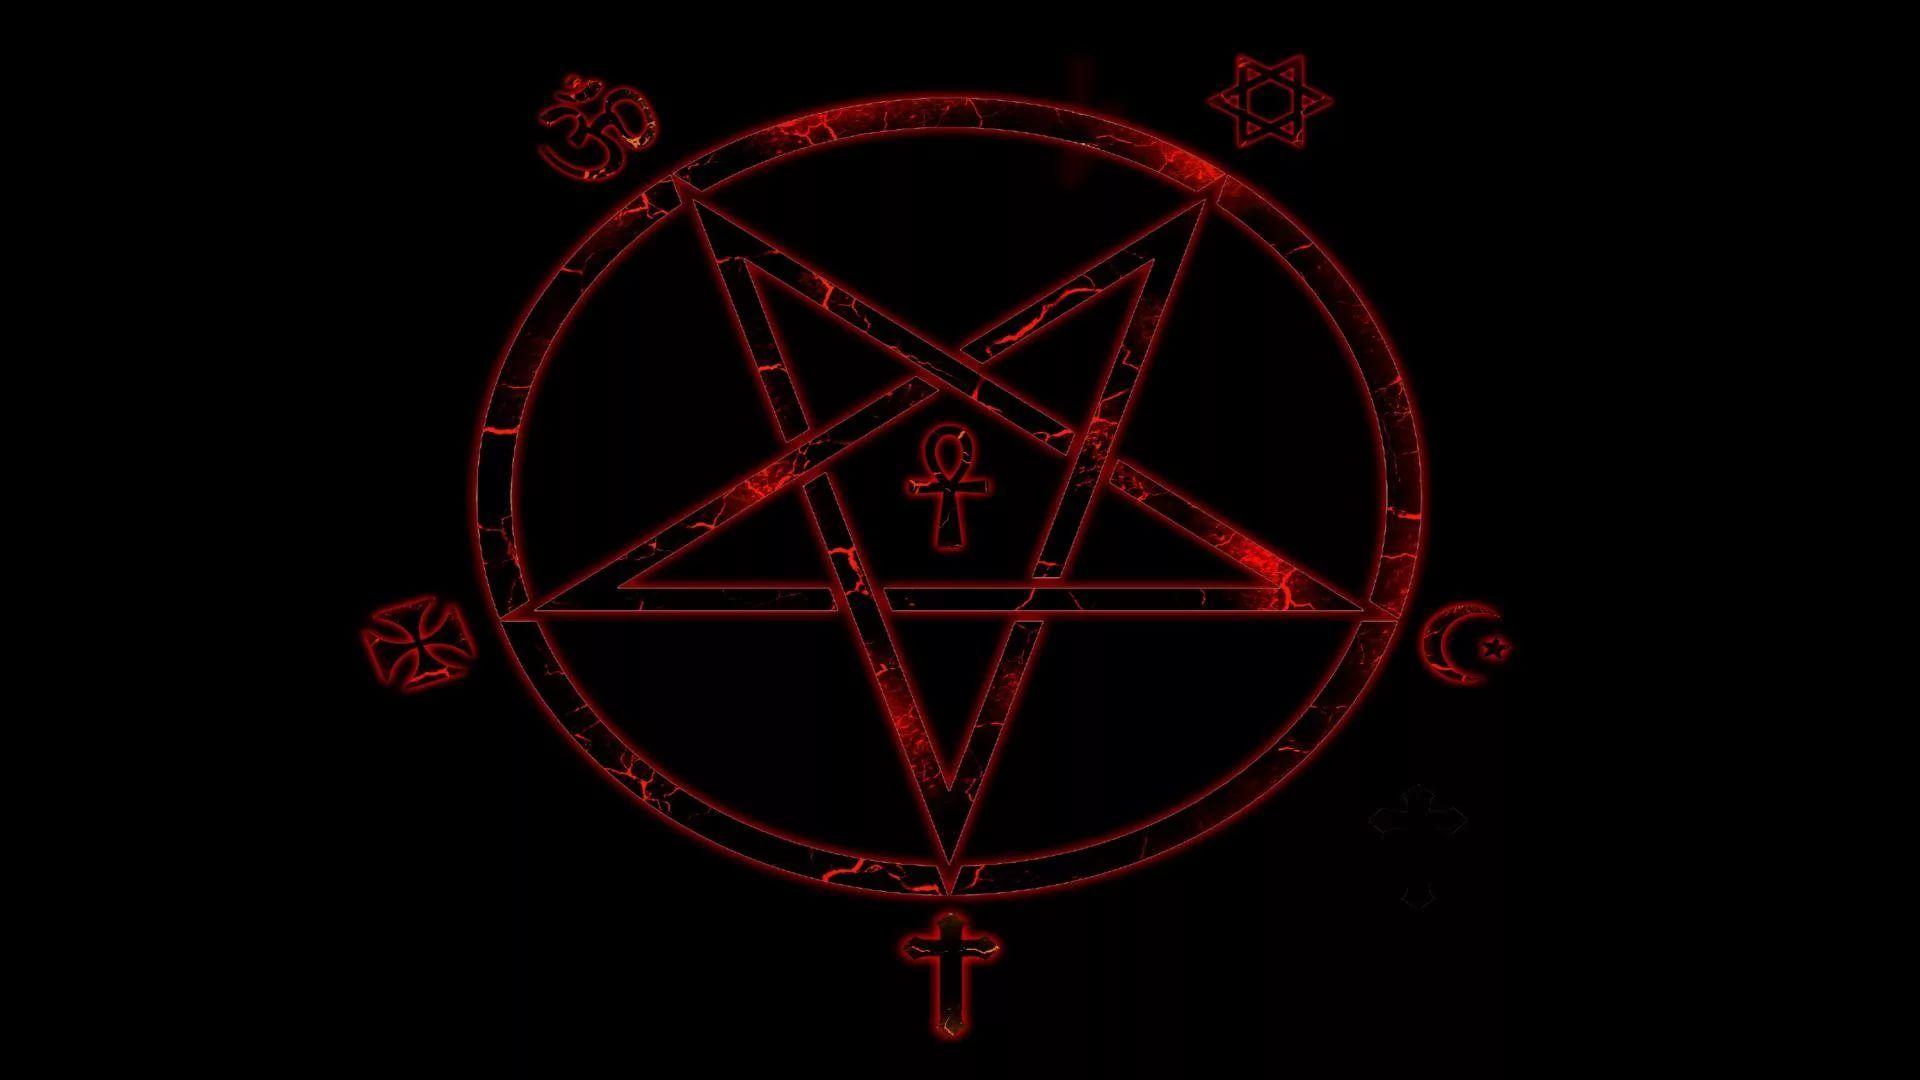 Pentagram wallpaper photo hd